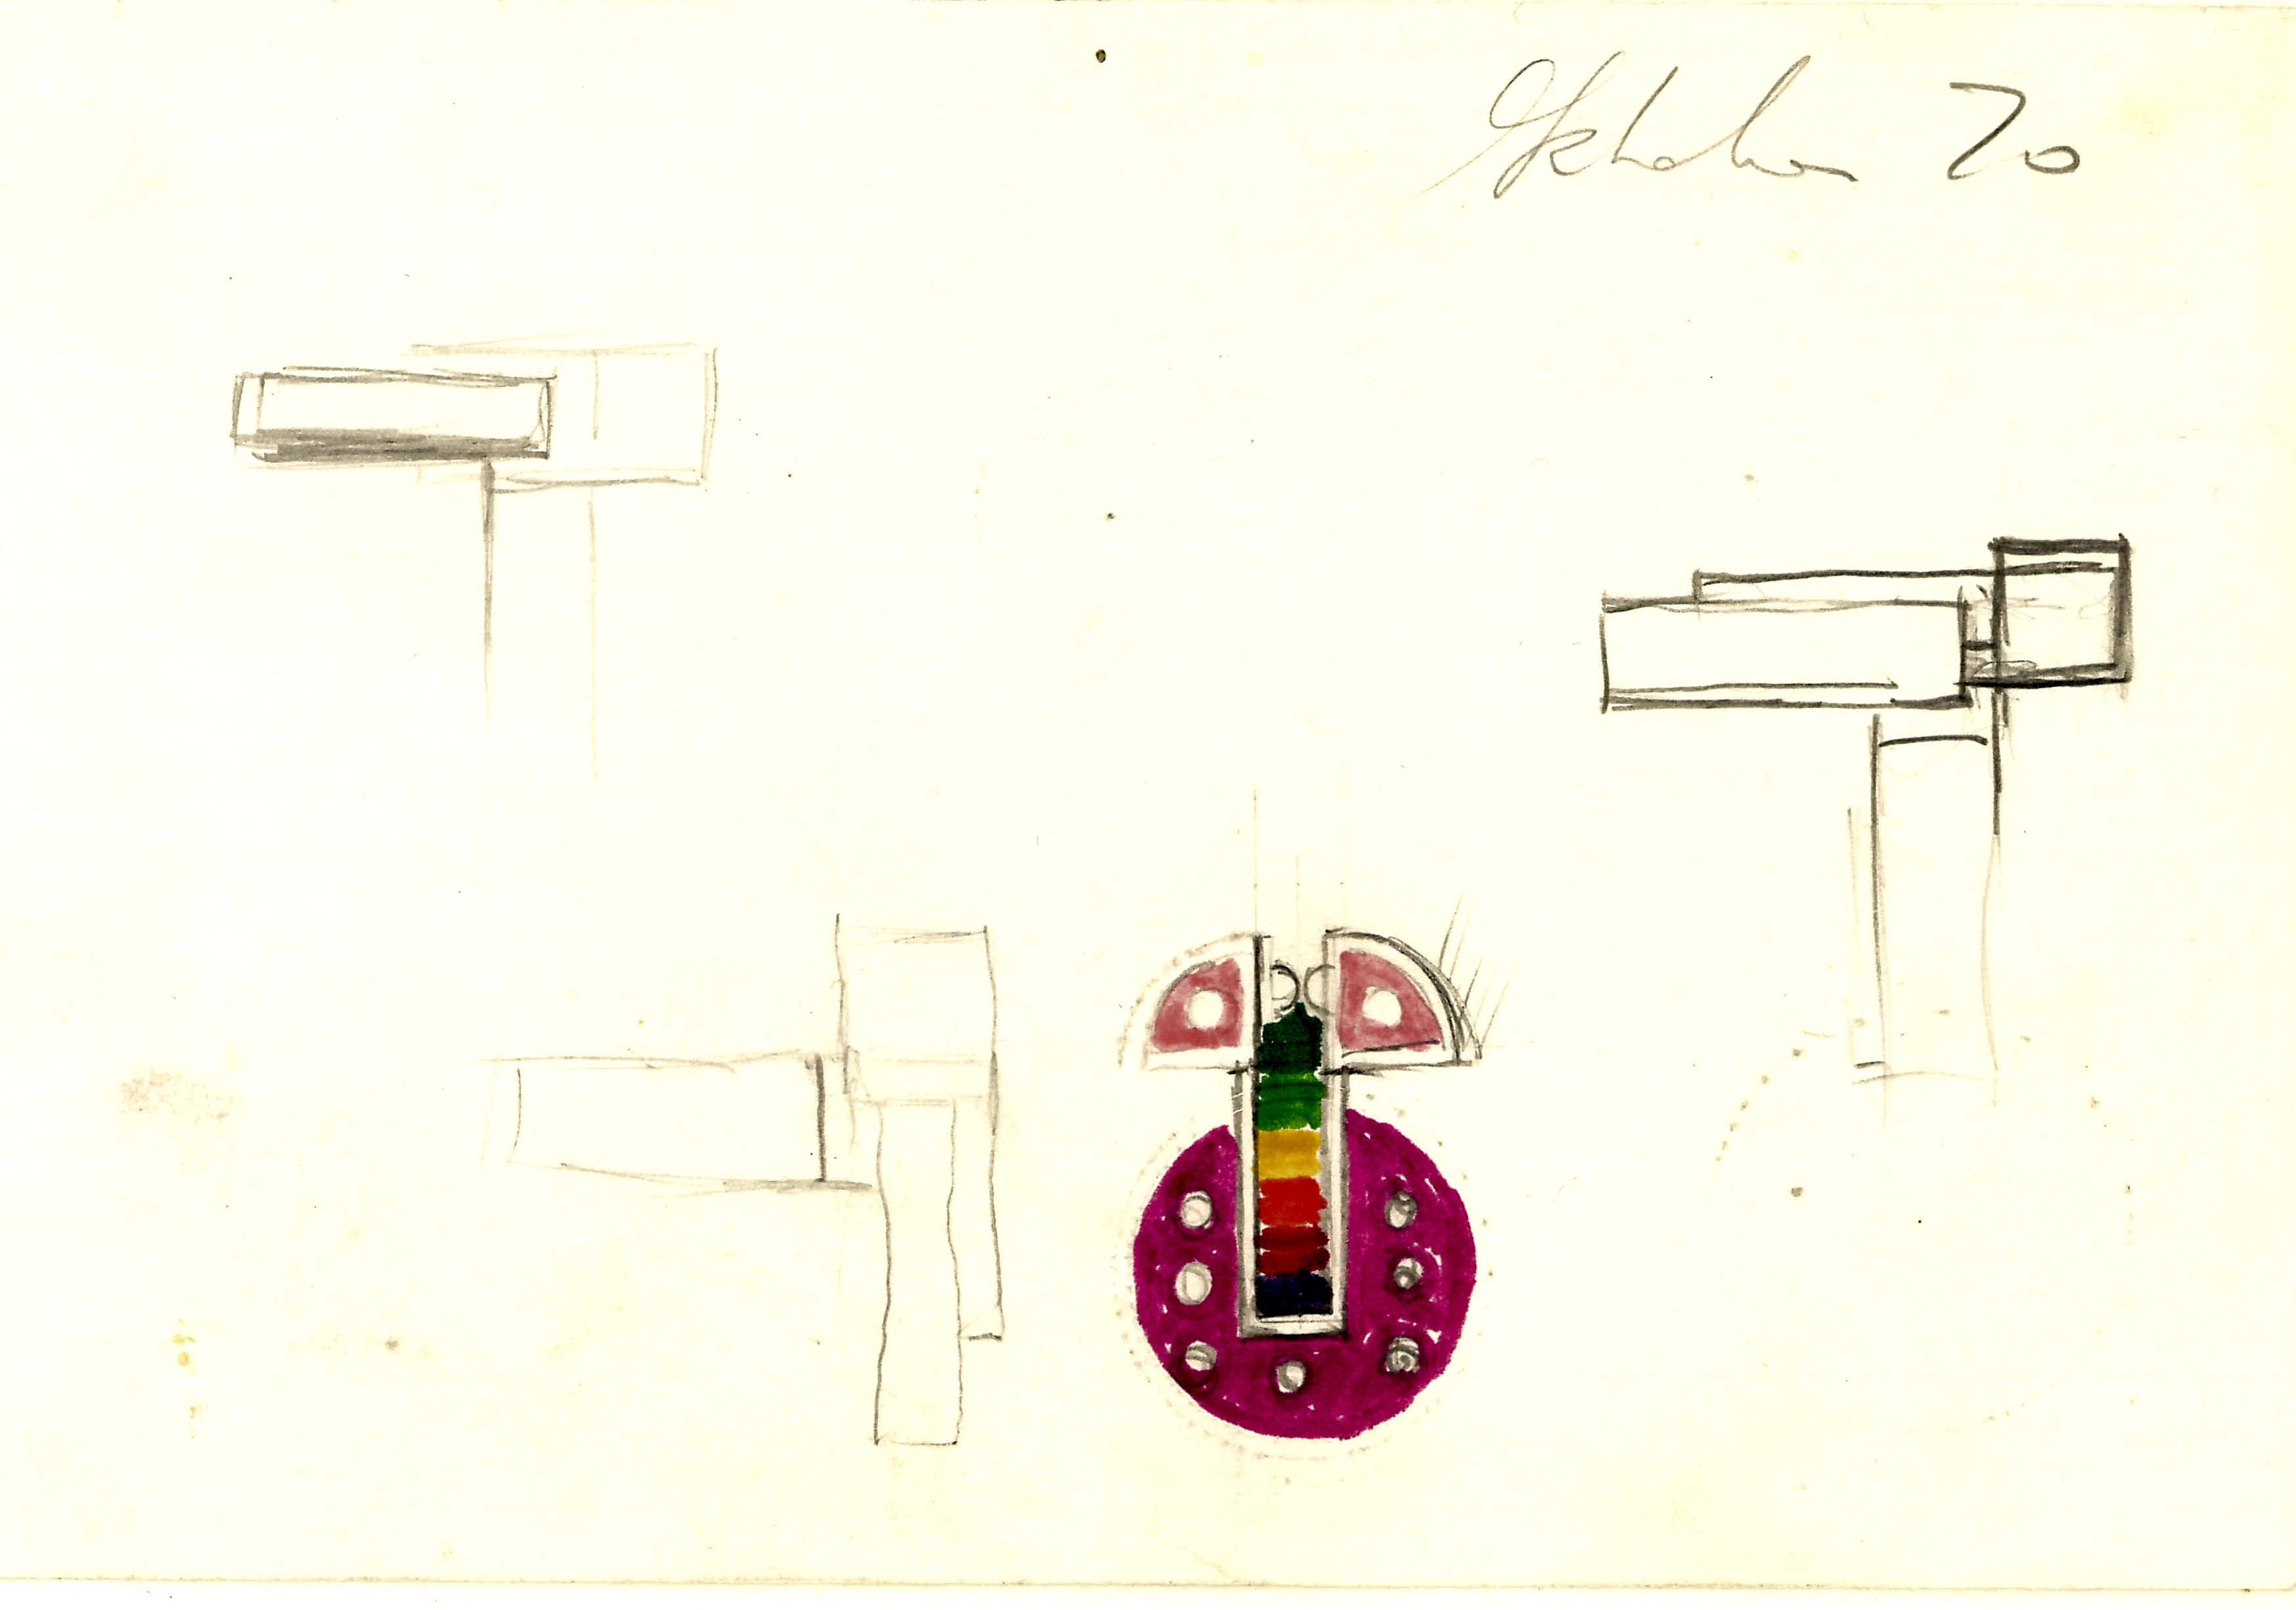 Fritz Maierhofer, tekening broche, 1970. Collectie Boelen